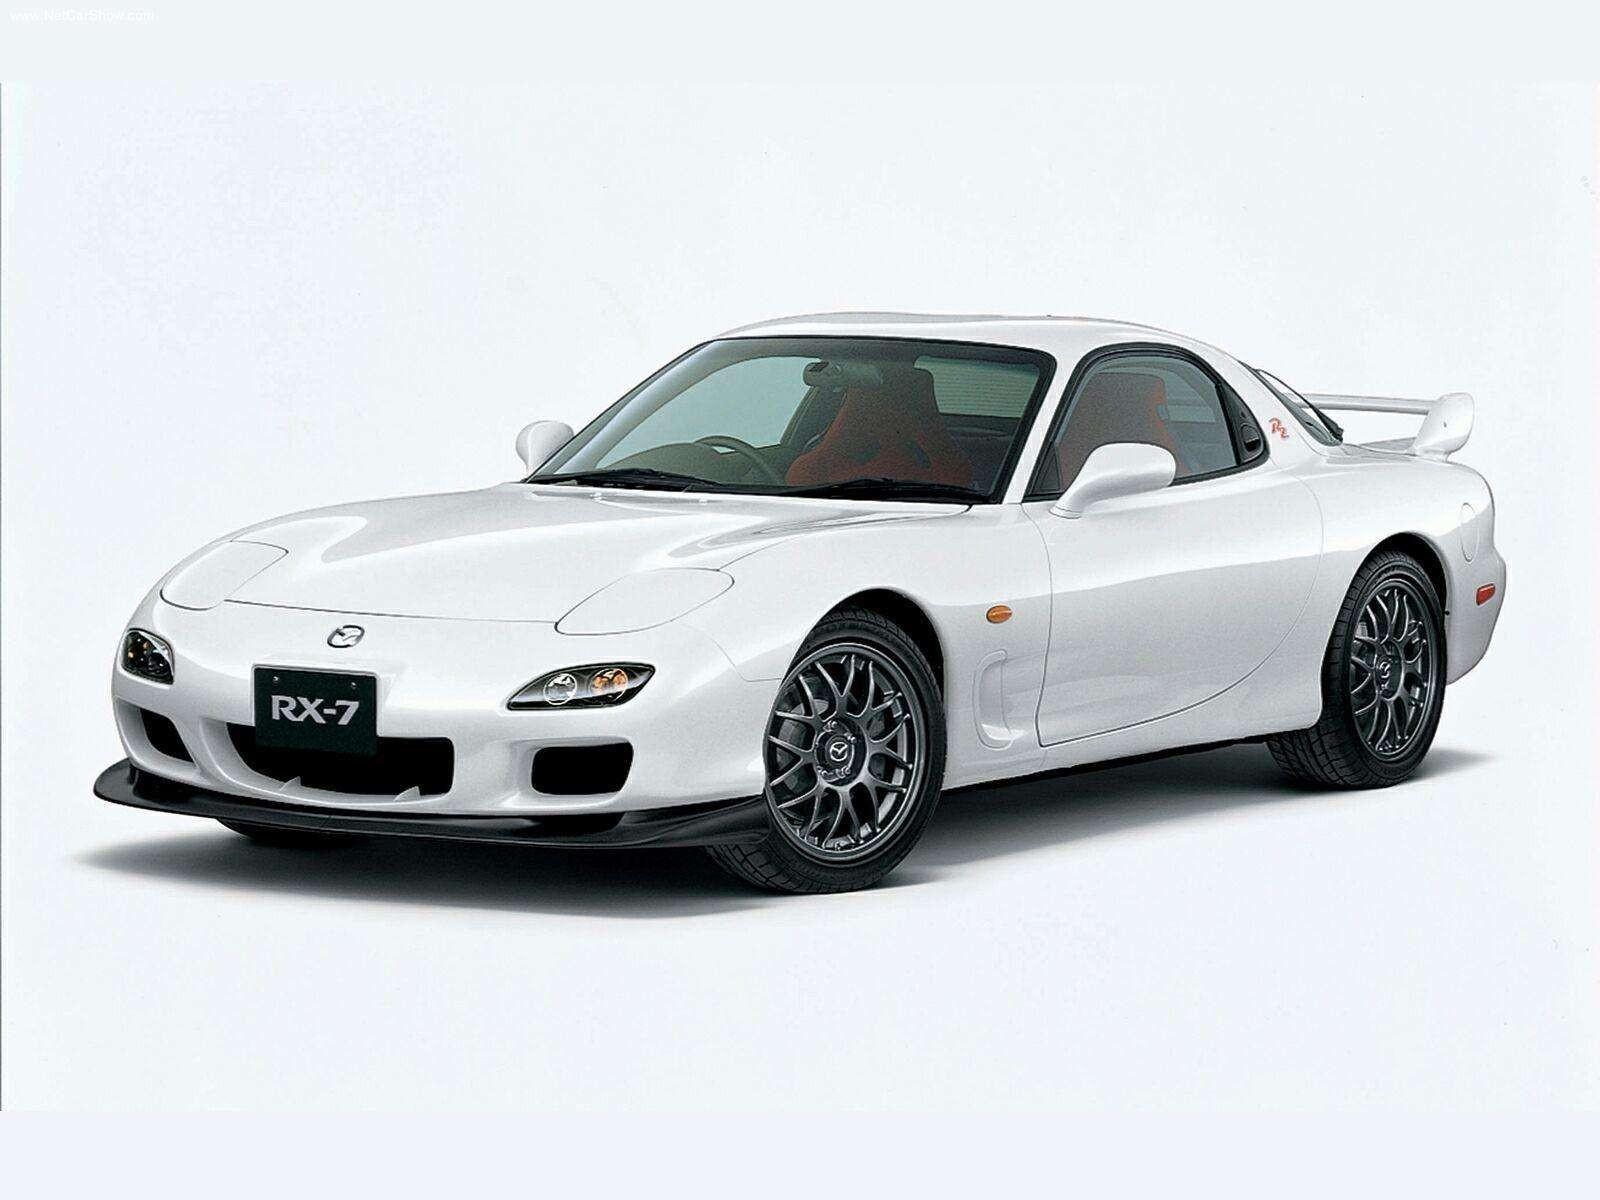 Mazda RX-7 car